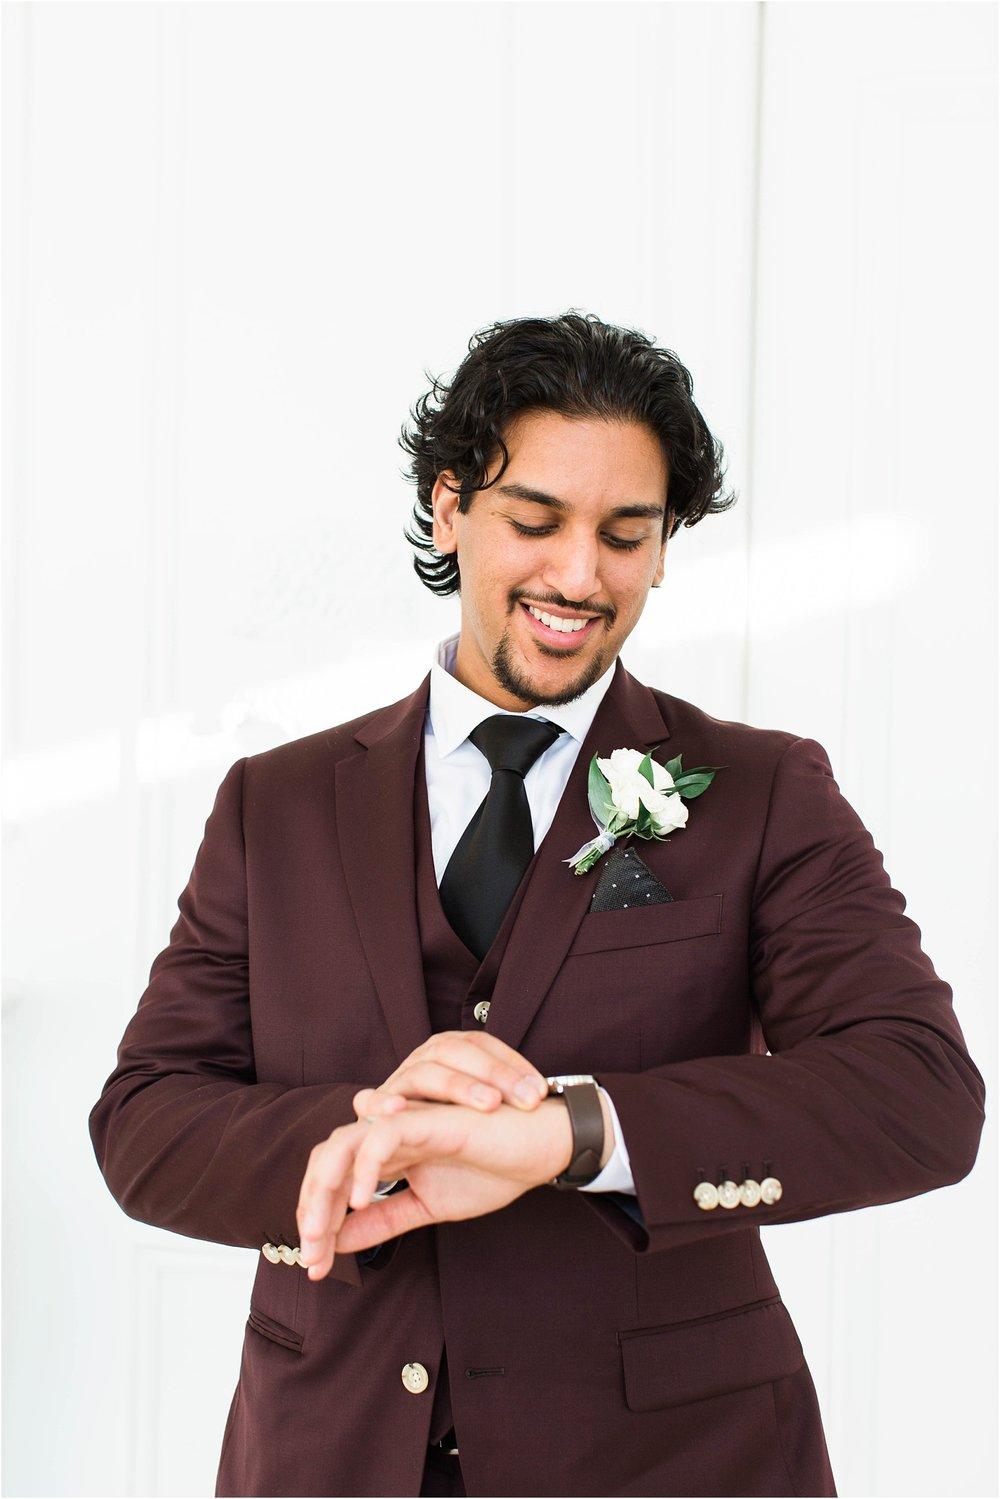 Red-Rose-Convention-Mint-Room-Wedding-Toronto-Mississauga-Brampton-Scarborough-GTA-Pakistani-Indian-Wedding-Engagement-Photographer-Photography_0111.jpg